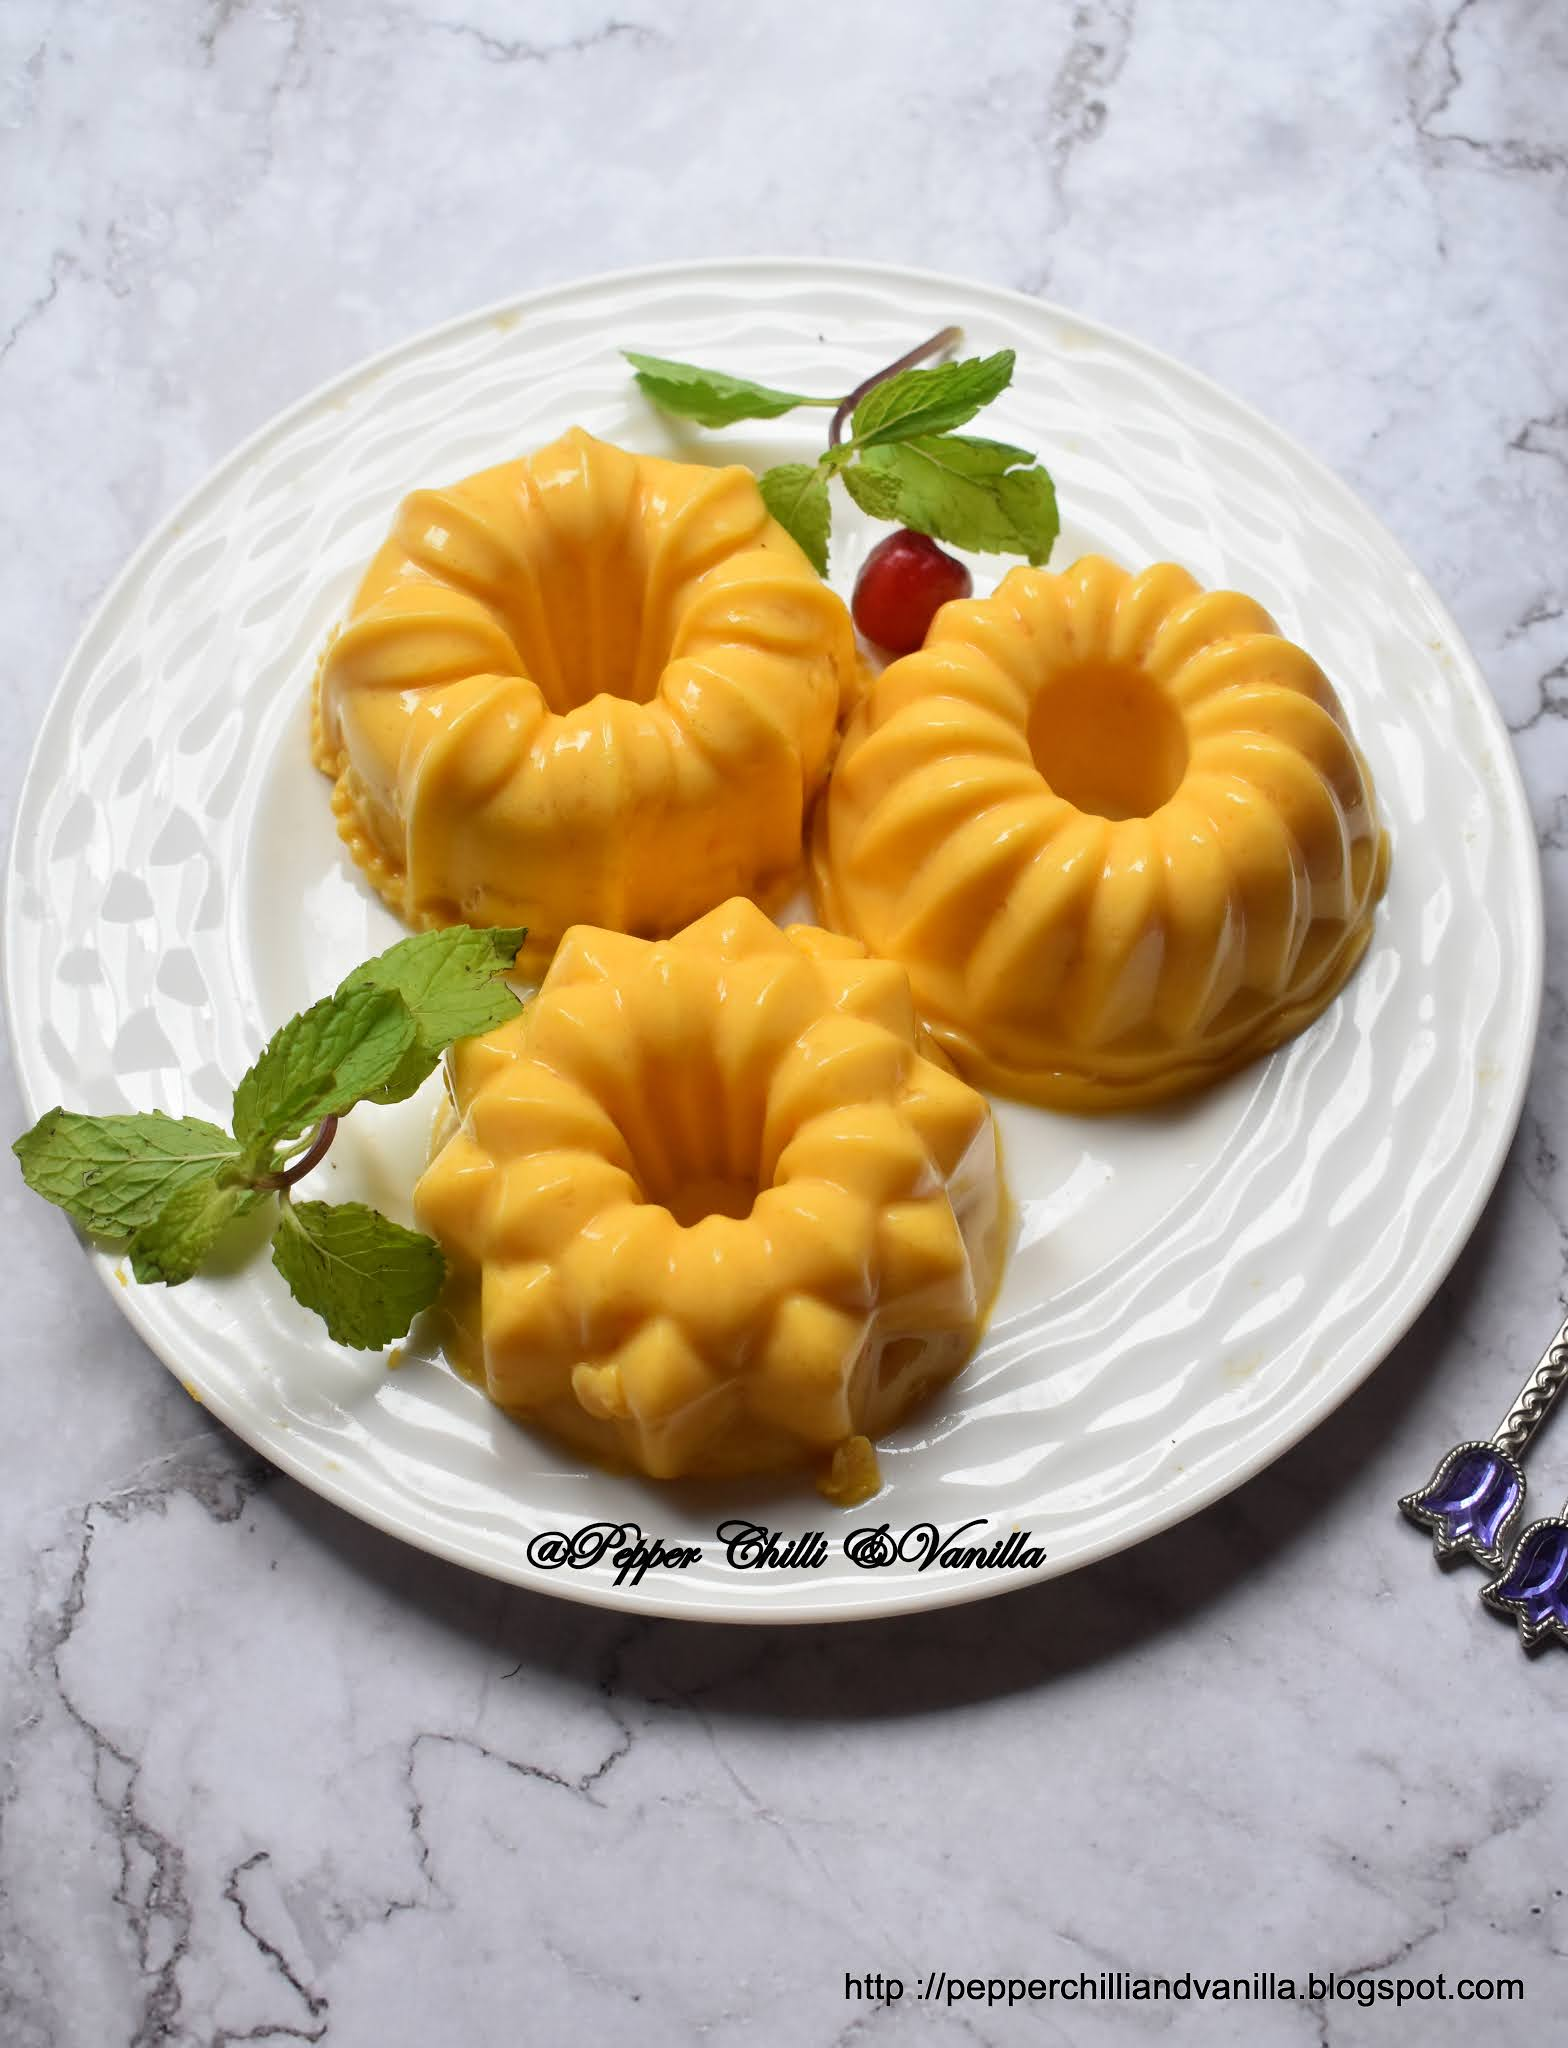 mango china grass,mango agar agar pudding